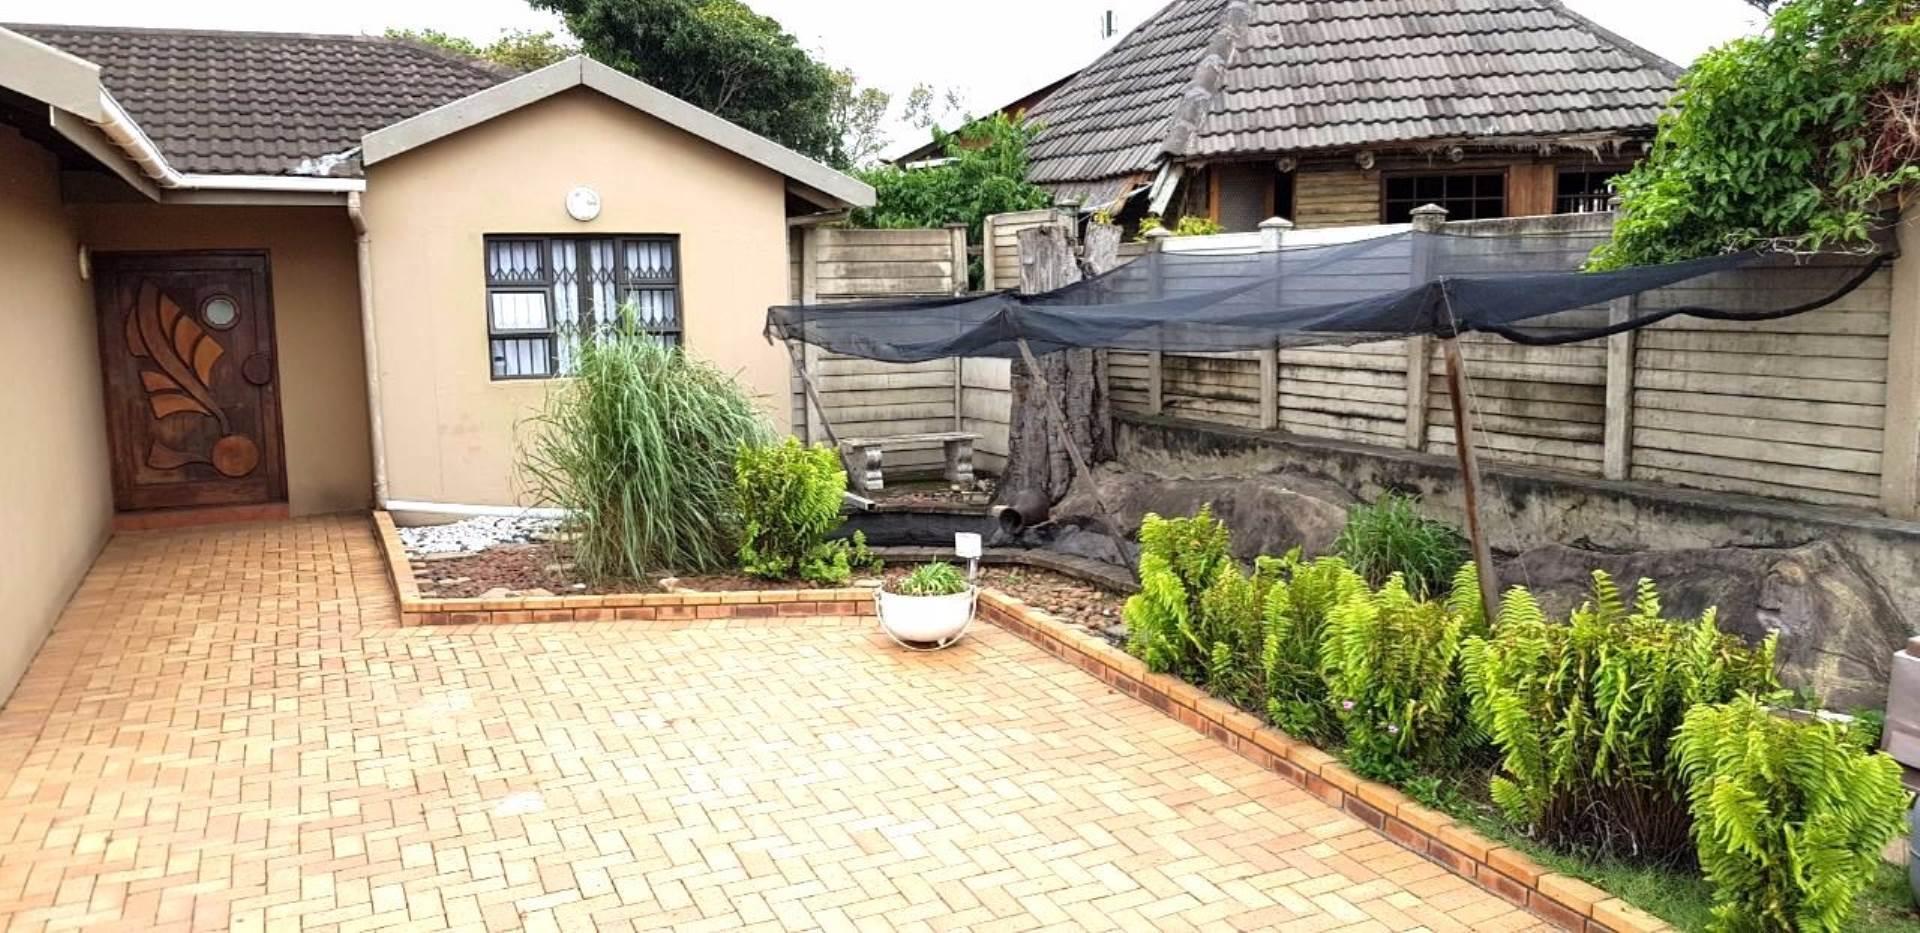 4 BedroomHouse For Sale In Arboretum